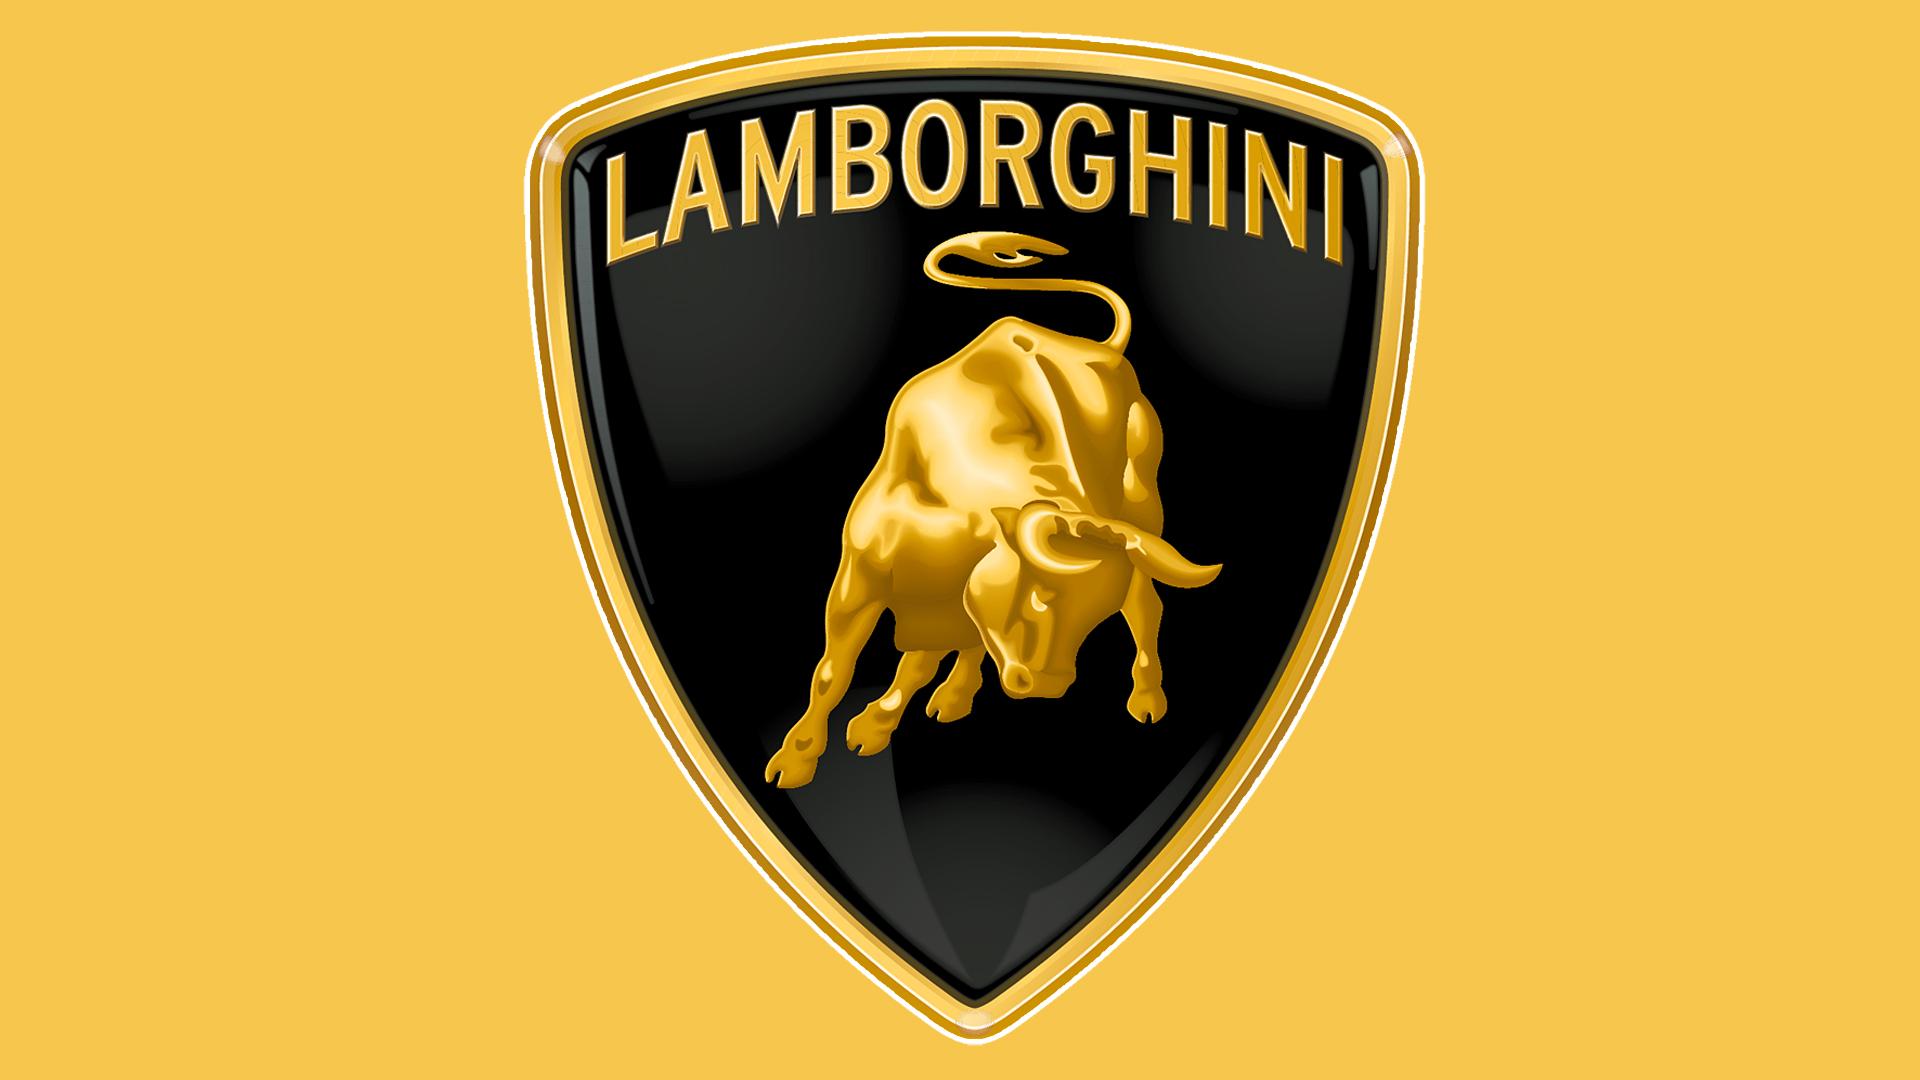 Meaning Lamborghini logo and symbol.